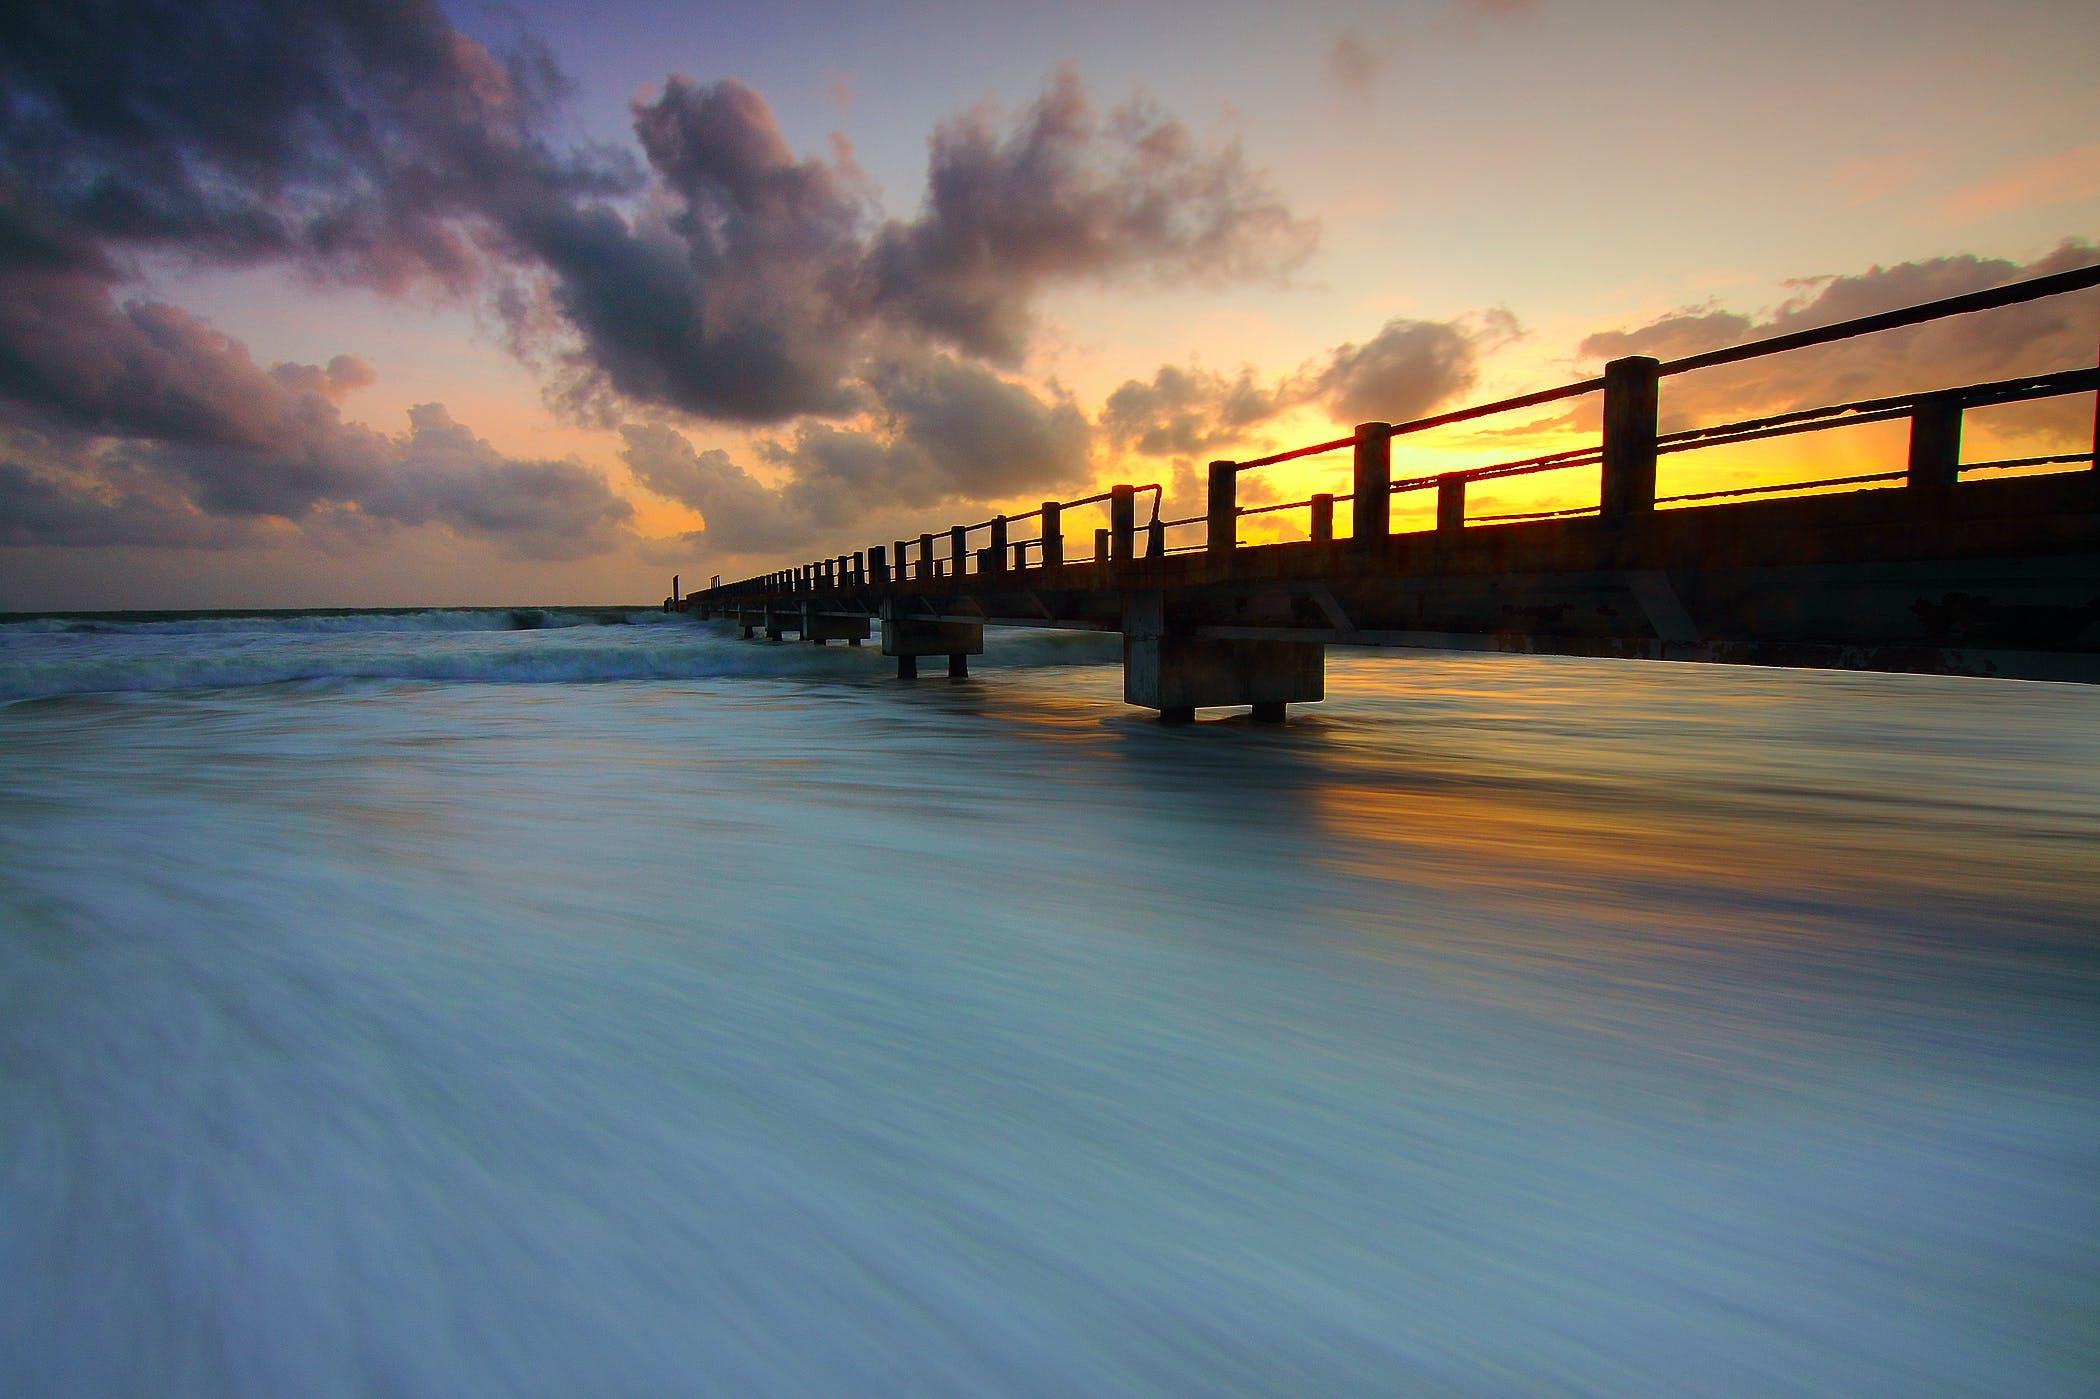 Wooden Pier on Ocean Waves